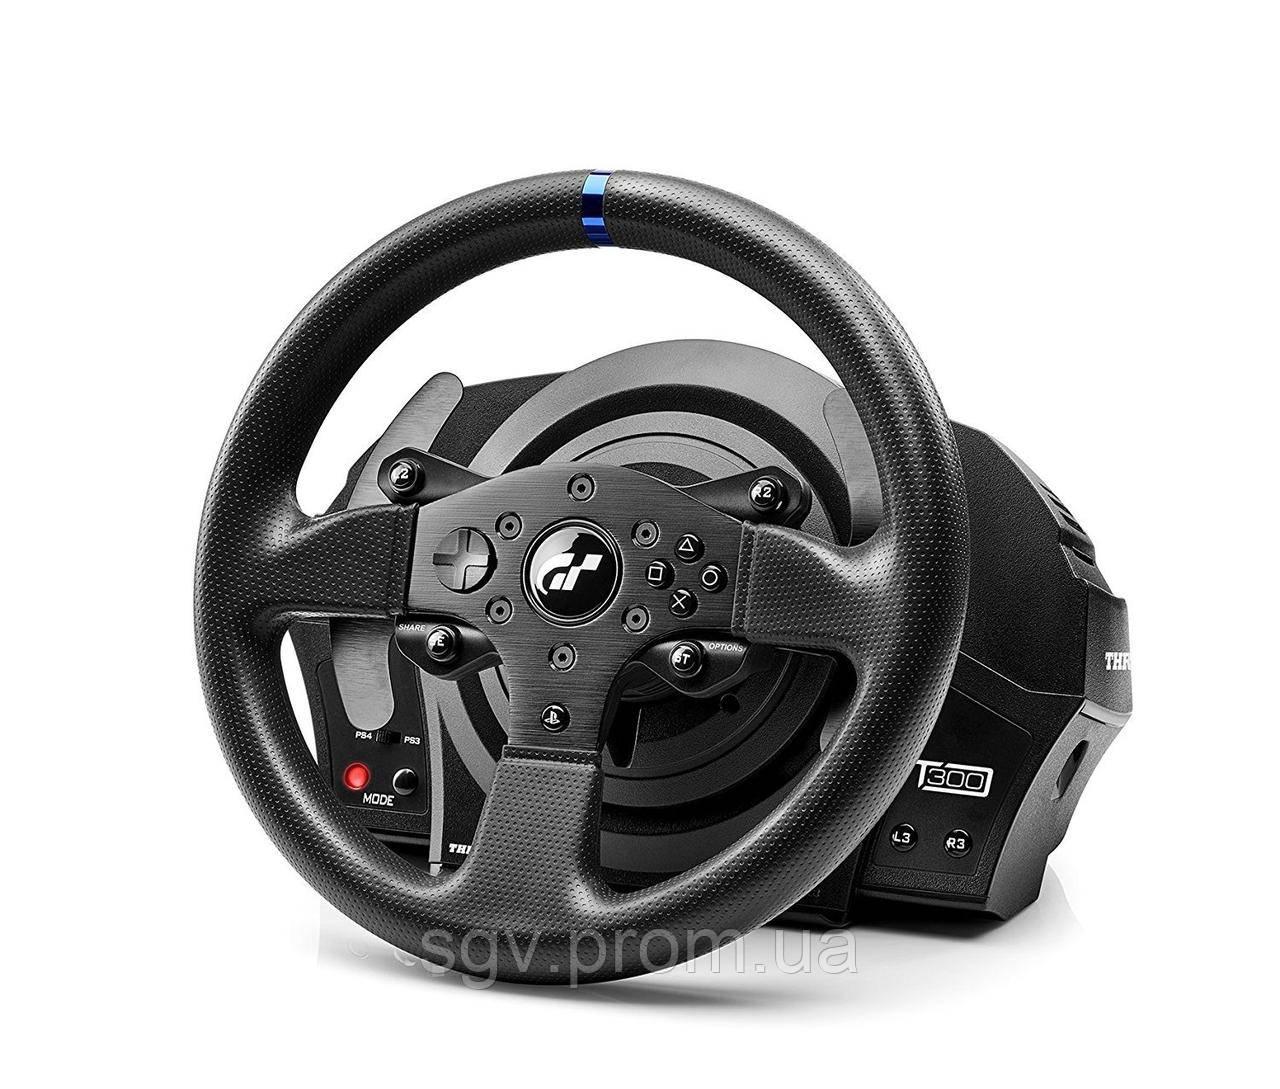 Thrustmaster руль и педали для PC/PS4 T-GT